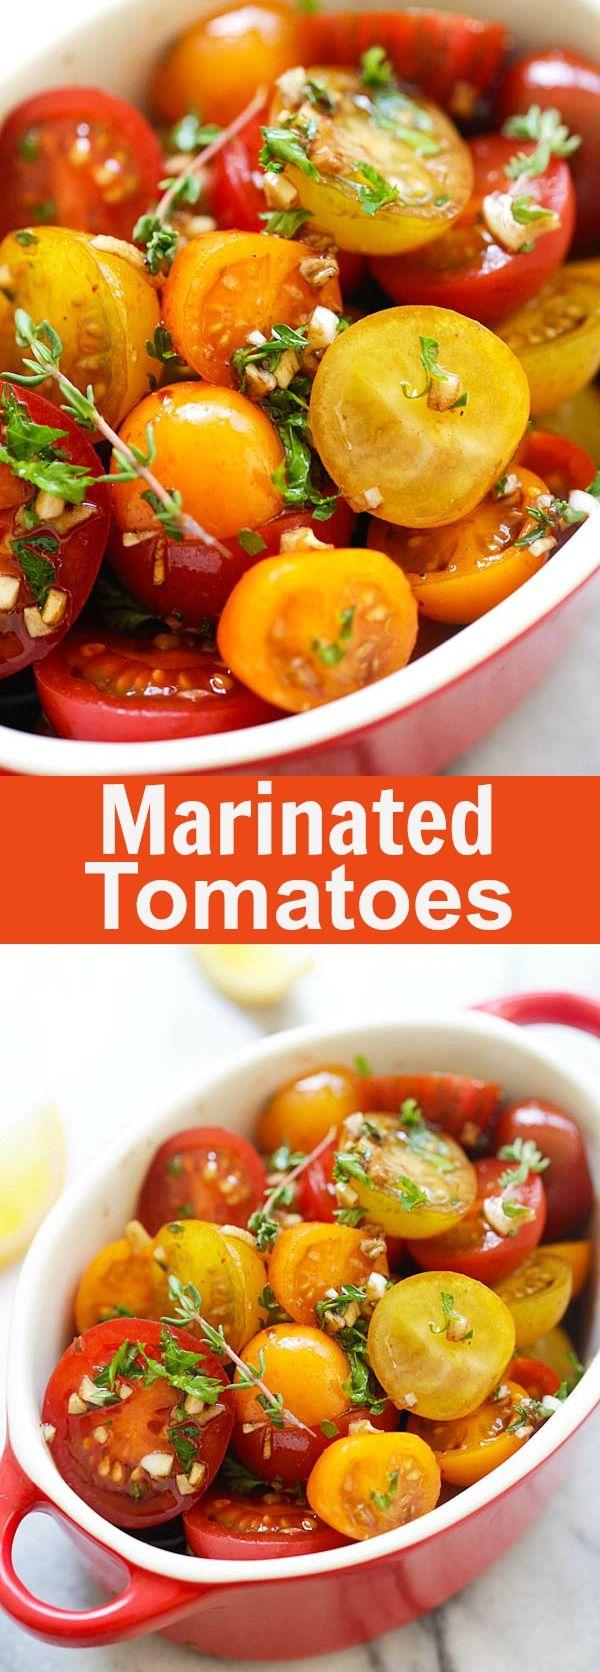 Marinated Tomatoes Marinated Tomatoes – healthy tomatoes marinated with olive oil, balsamic vinegar and herbs | rasamalaysia.com